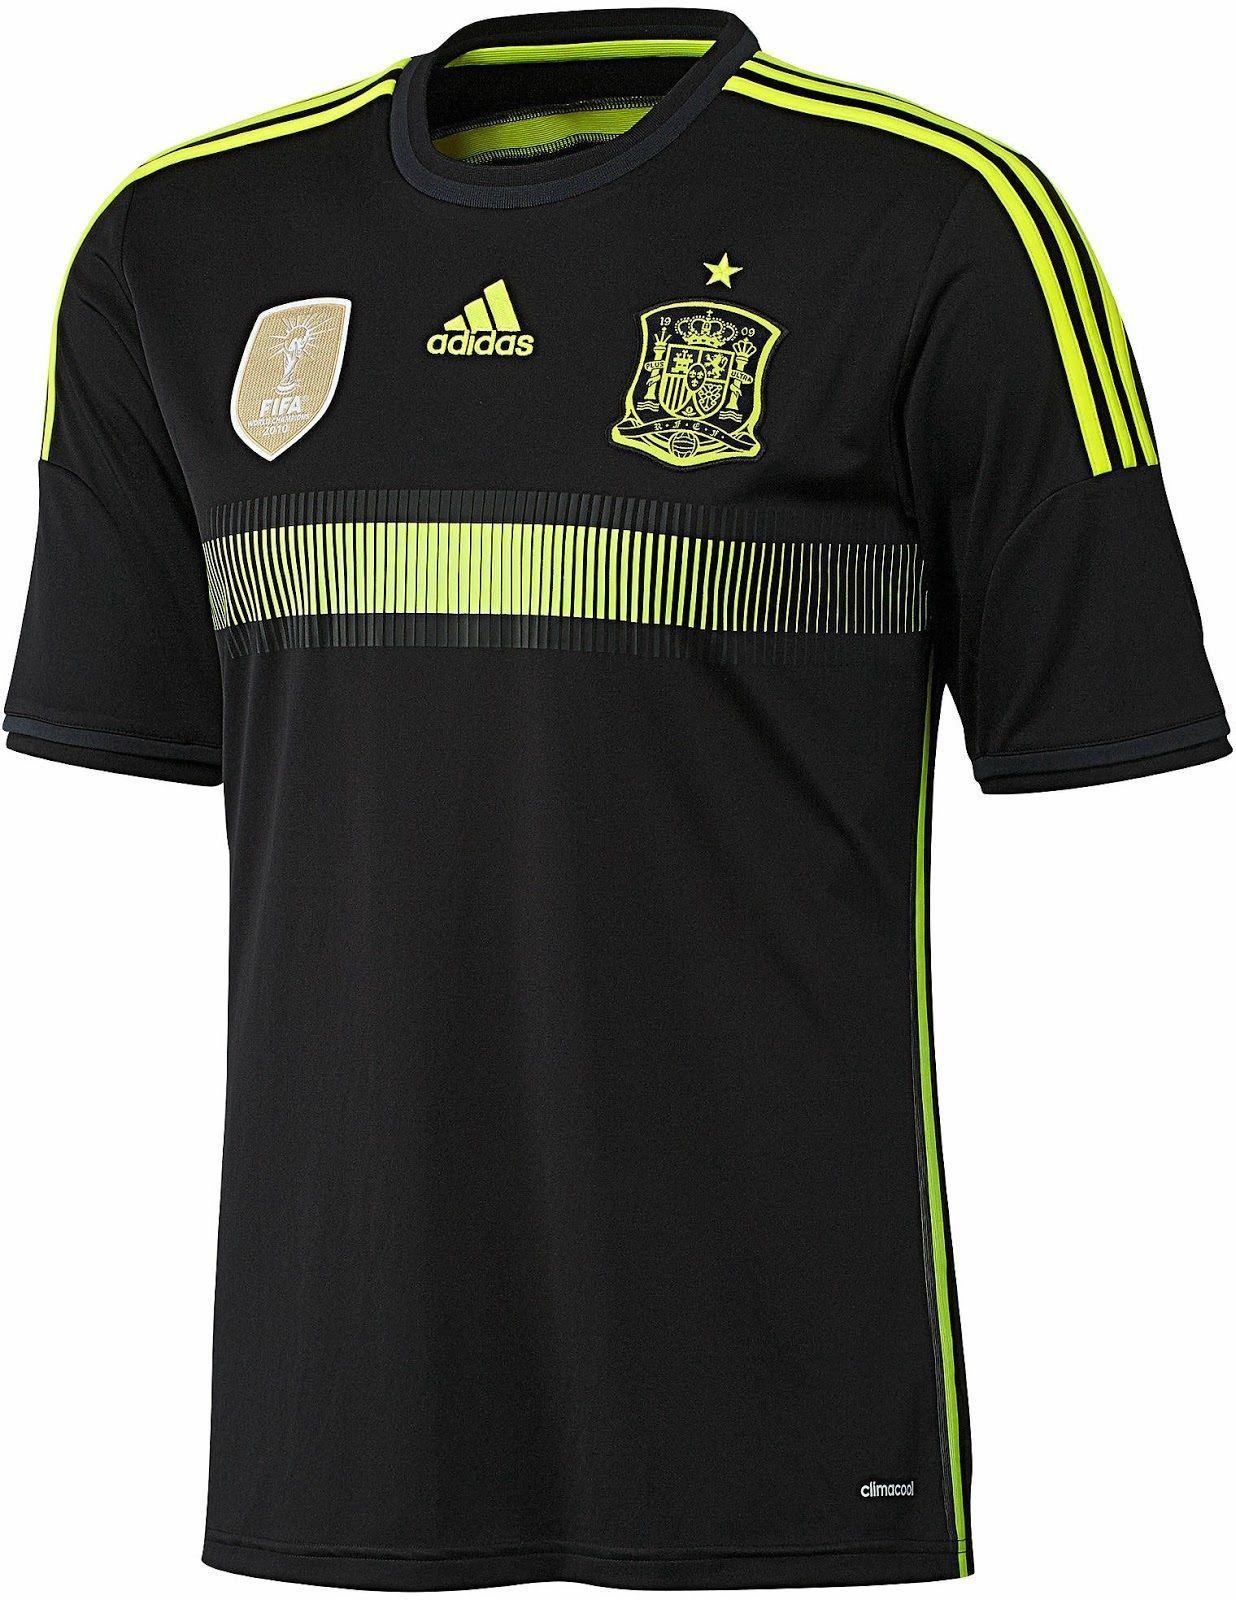 d43cc166192 ADIDAS SPAIN AWAY JERSEY FIFA WORLD CUP BRAZIL 2014 ESPAÑA BLACK/ELECTRICITY